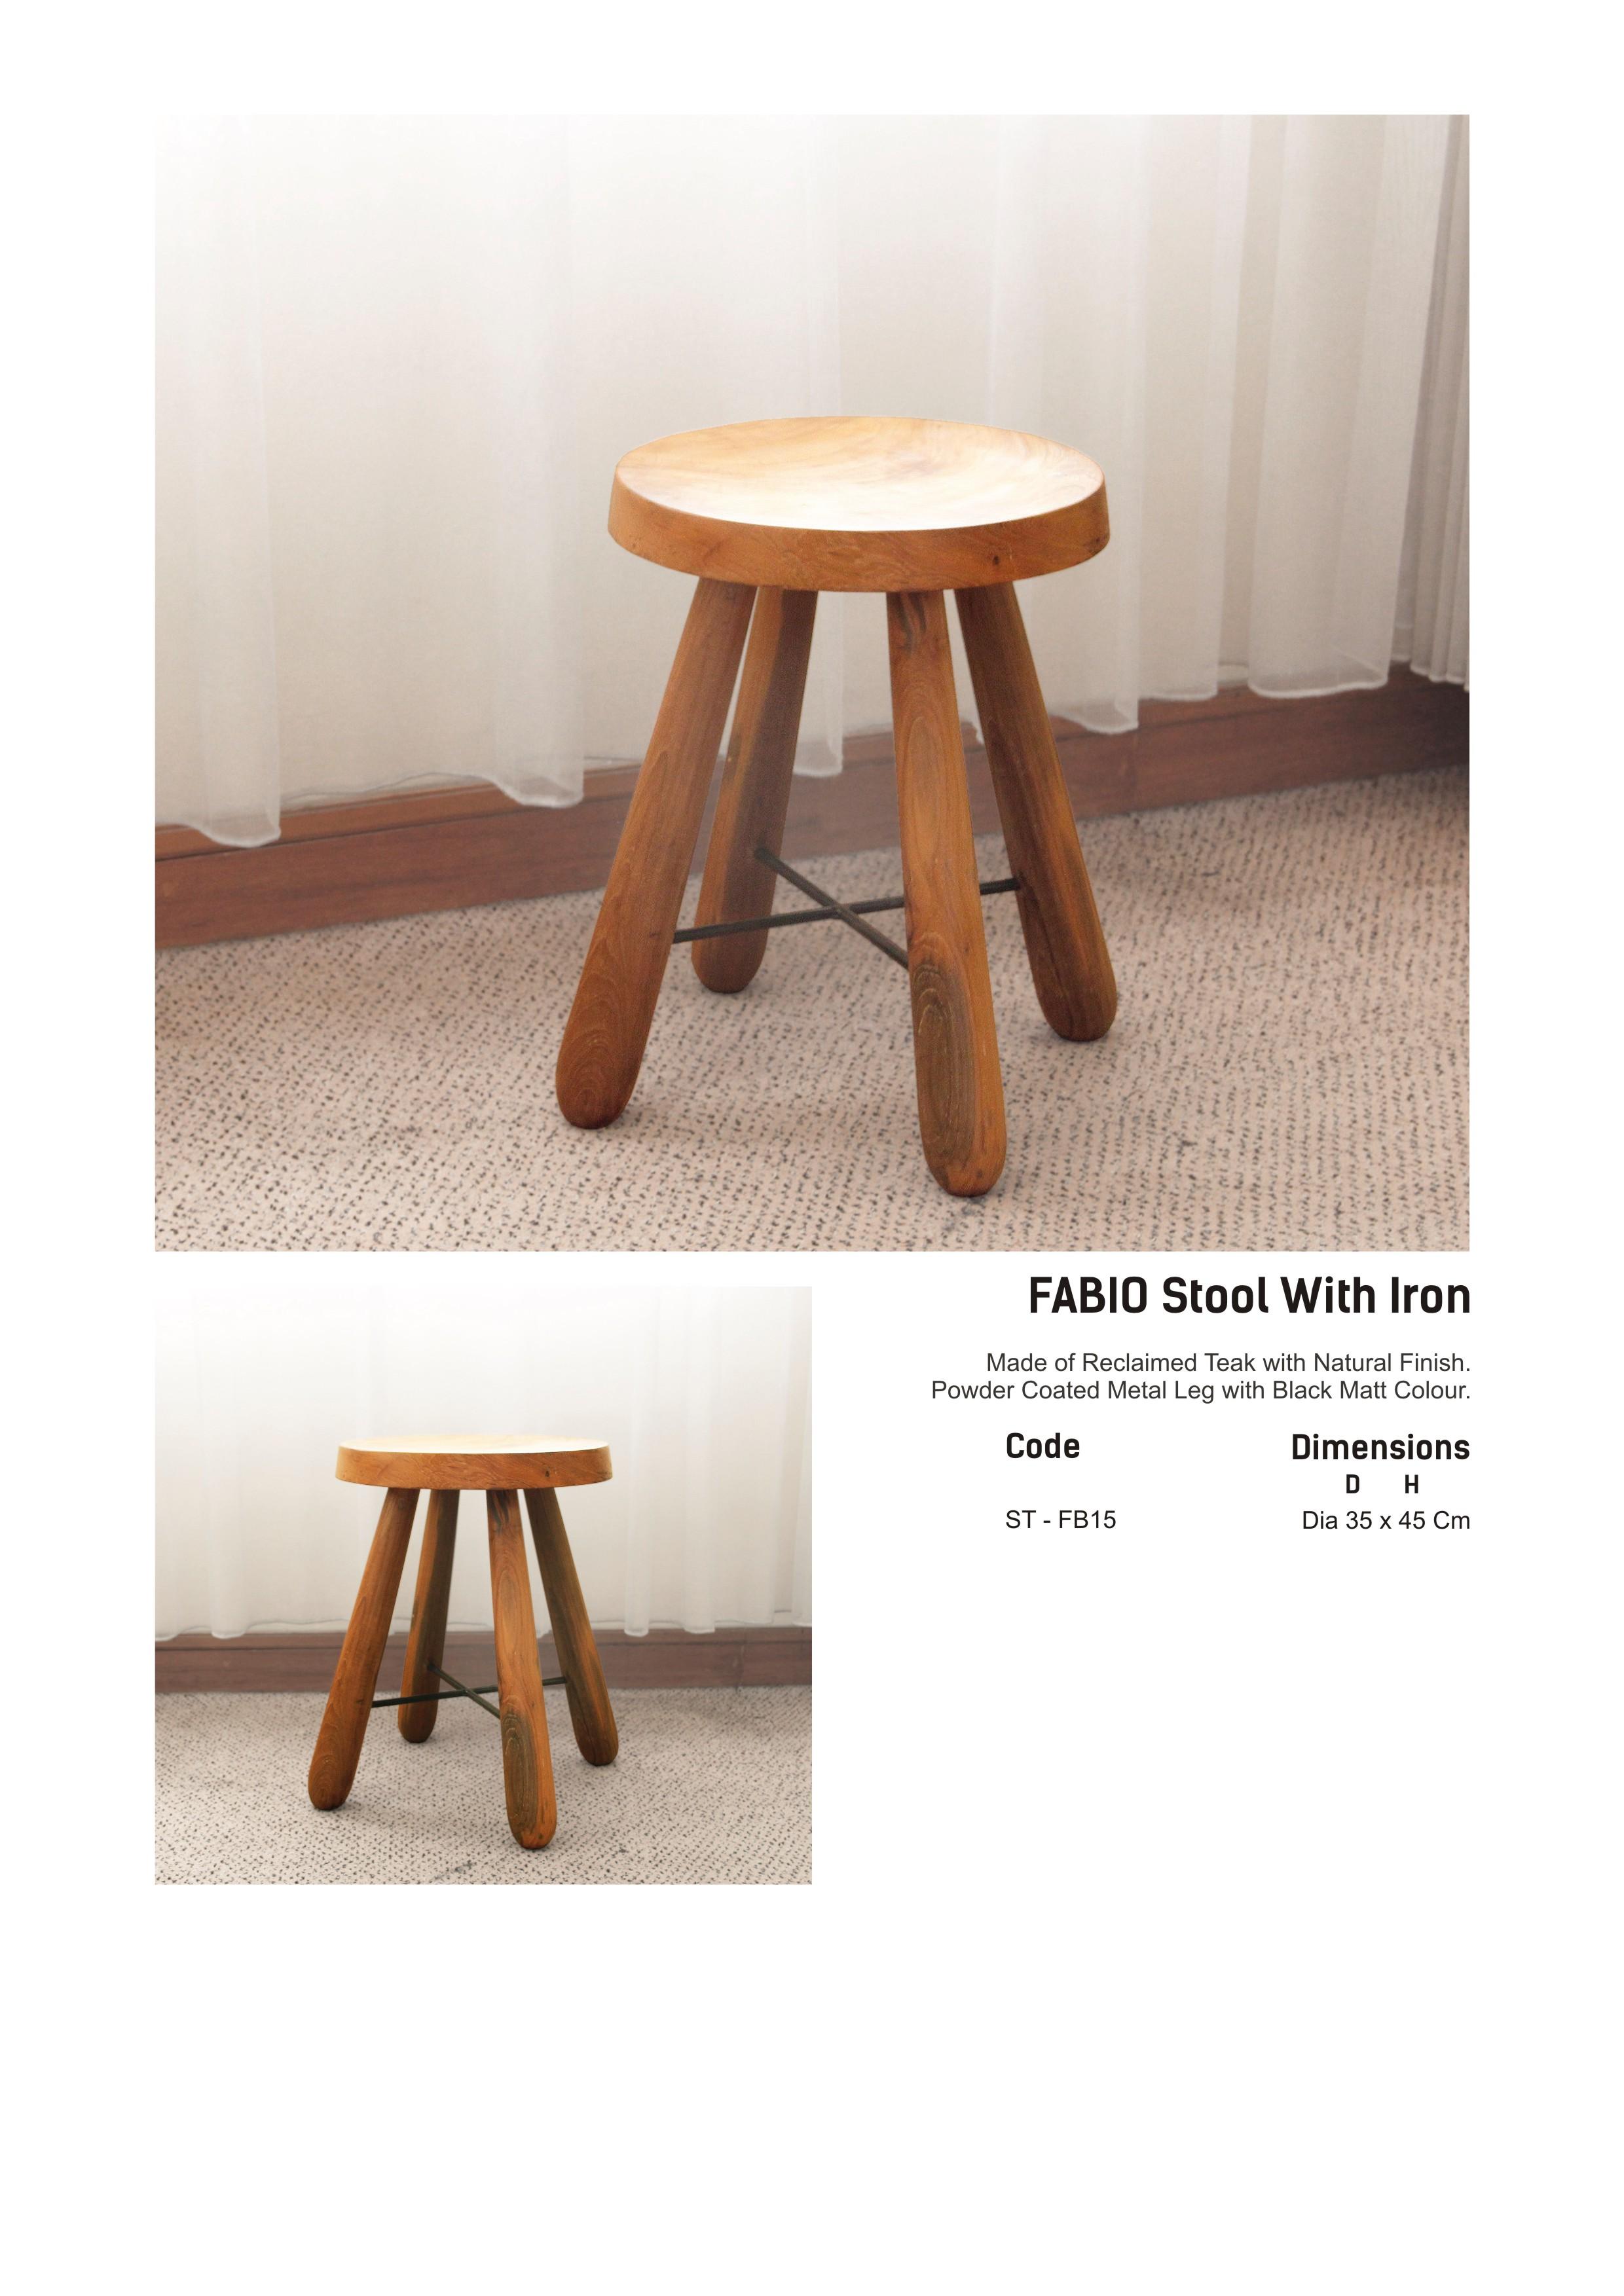 15. FABIO - Stool